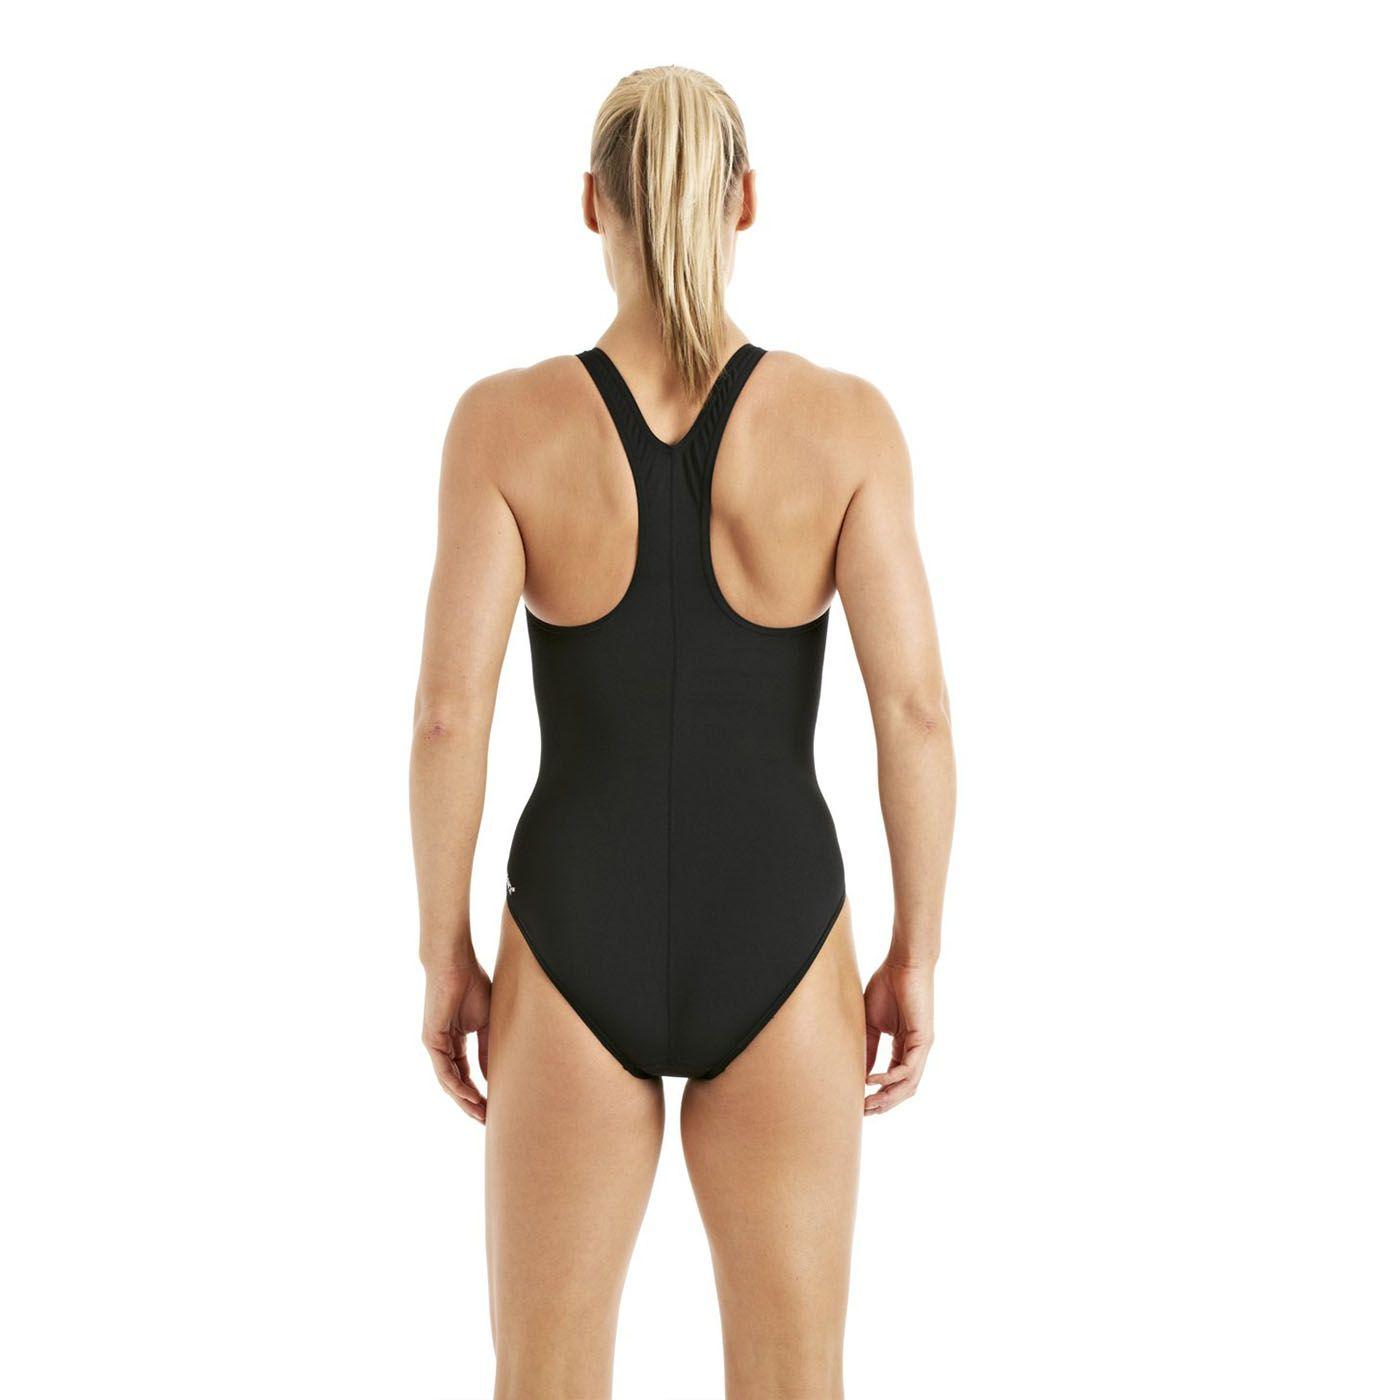 Fitness Design Gym Gym: Speedo Endurance Plus Racerback Ladies Swimsuit